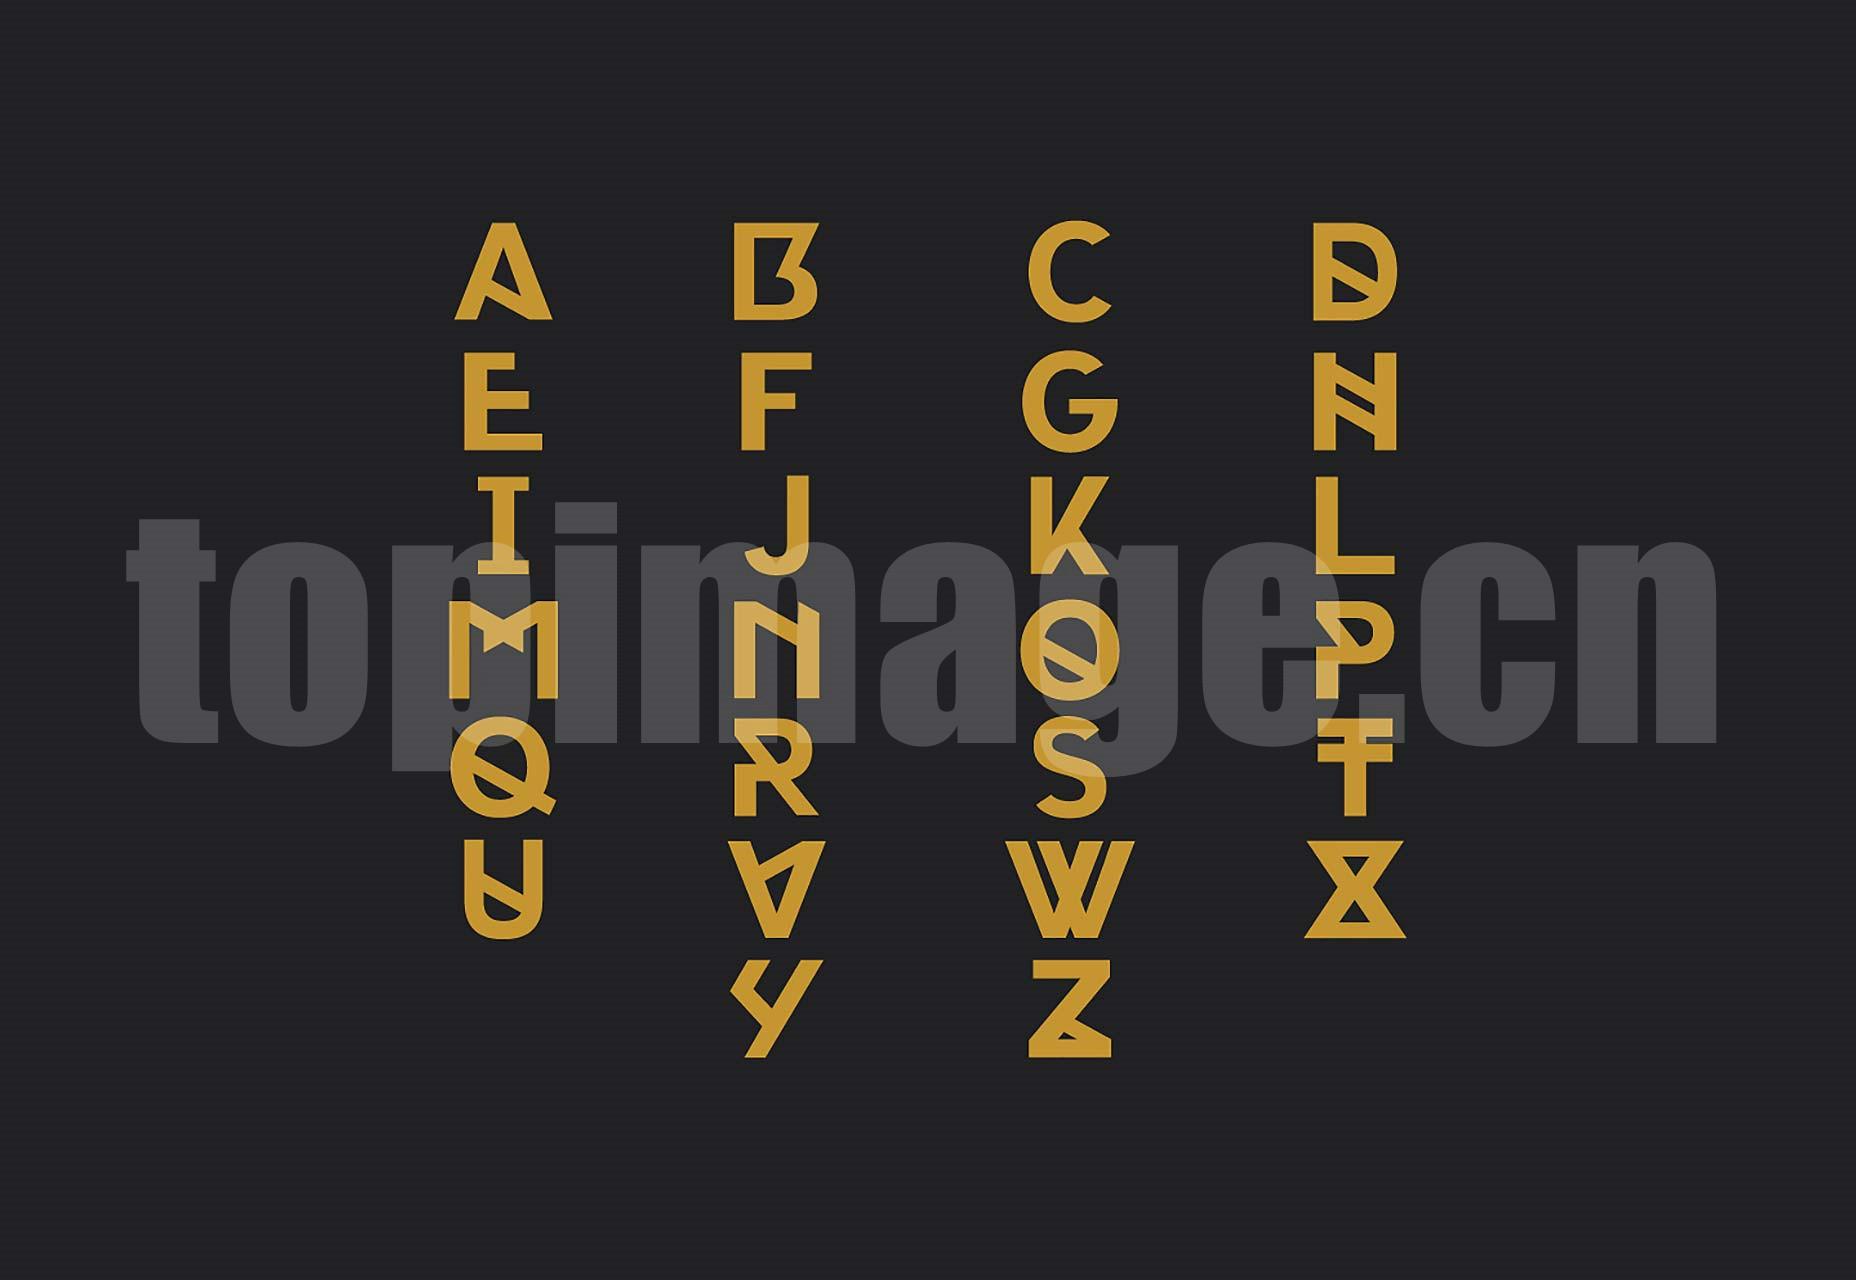 Portica创意海报 经典优雅 logo英文字体下载